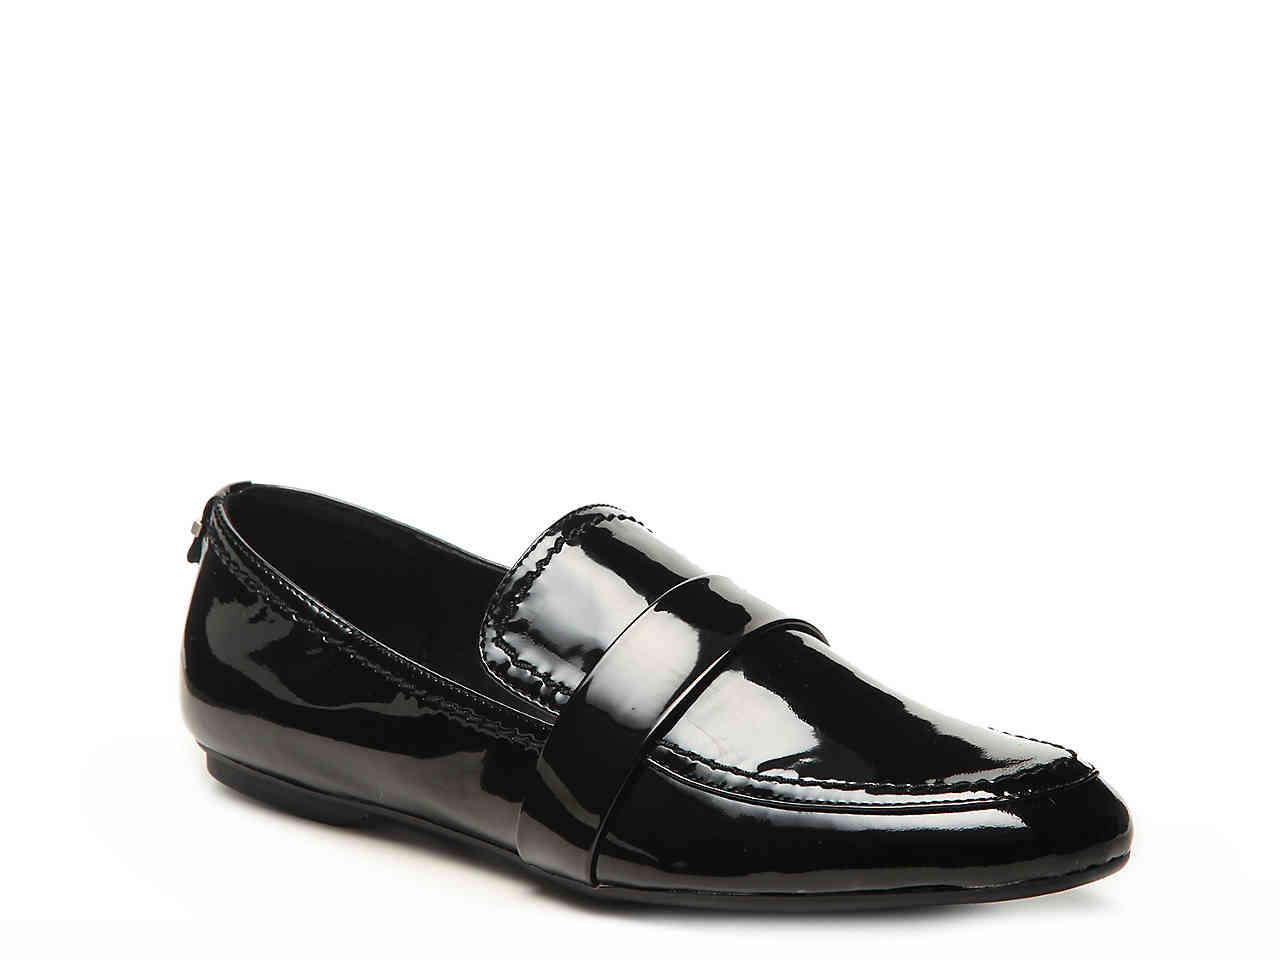 beb129a1a94 Lyst - Calvin Klein Olette Loafer in Black